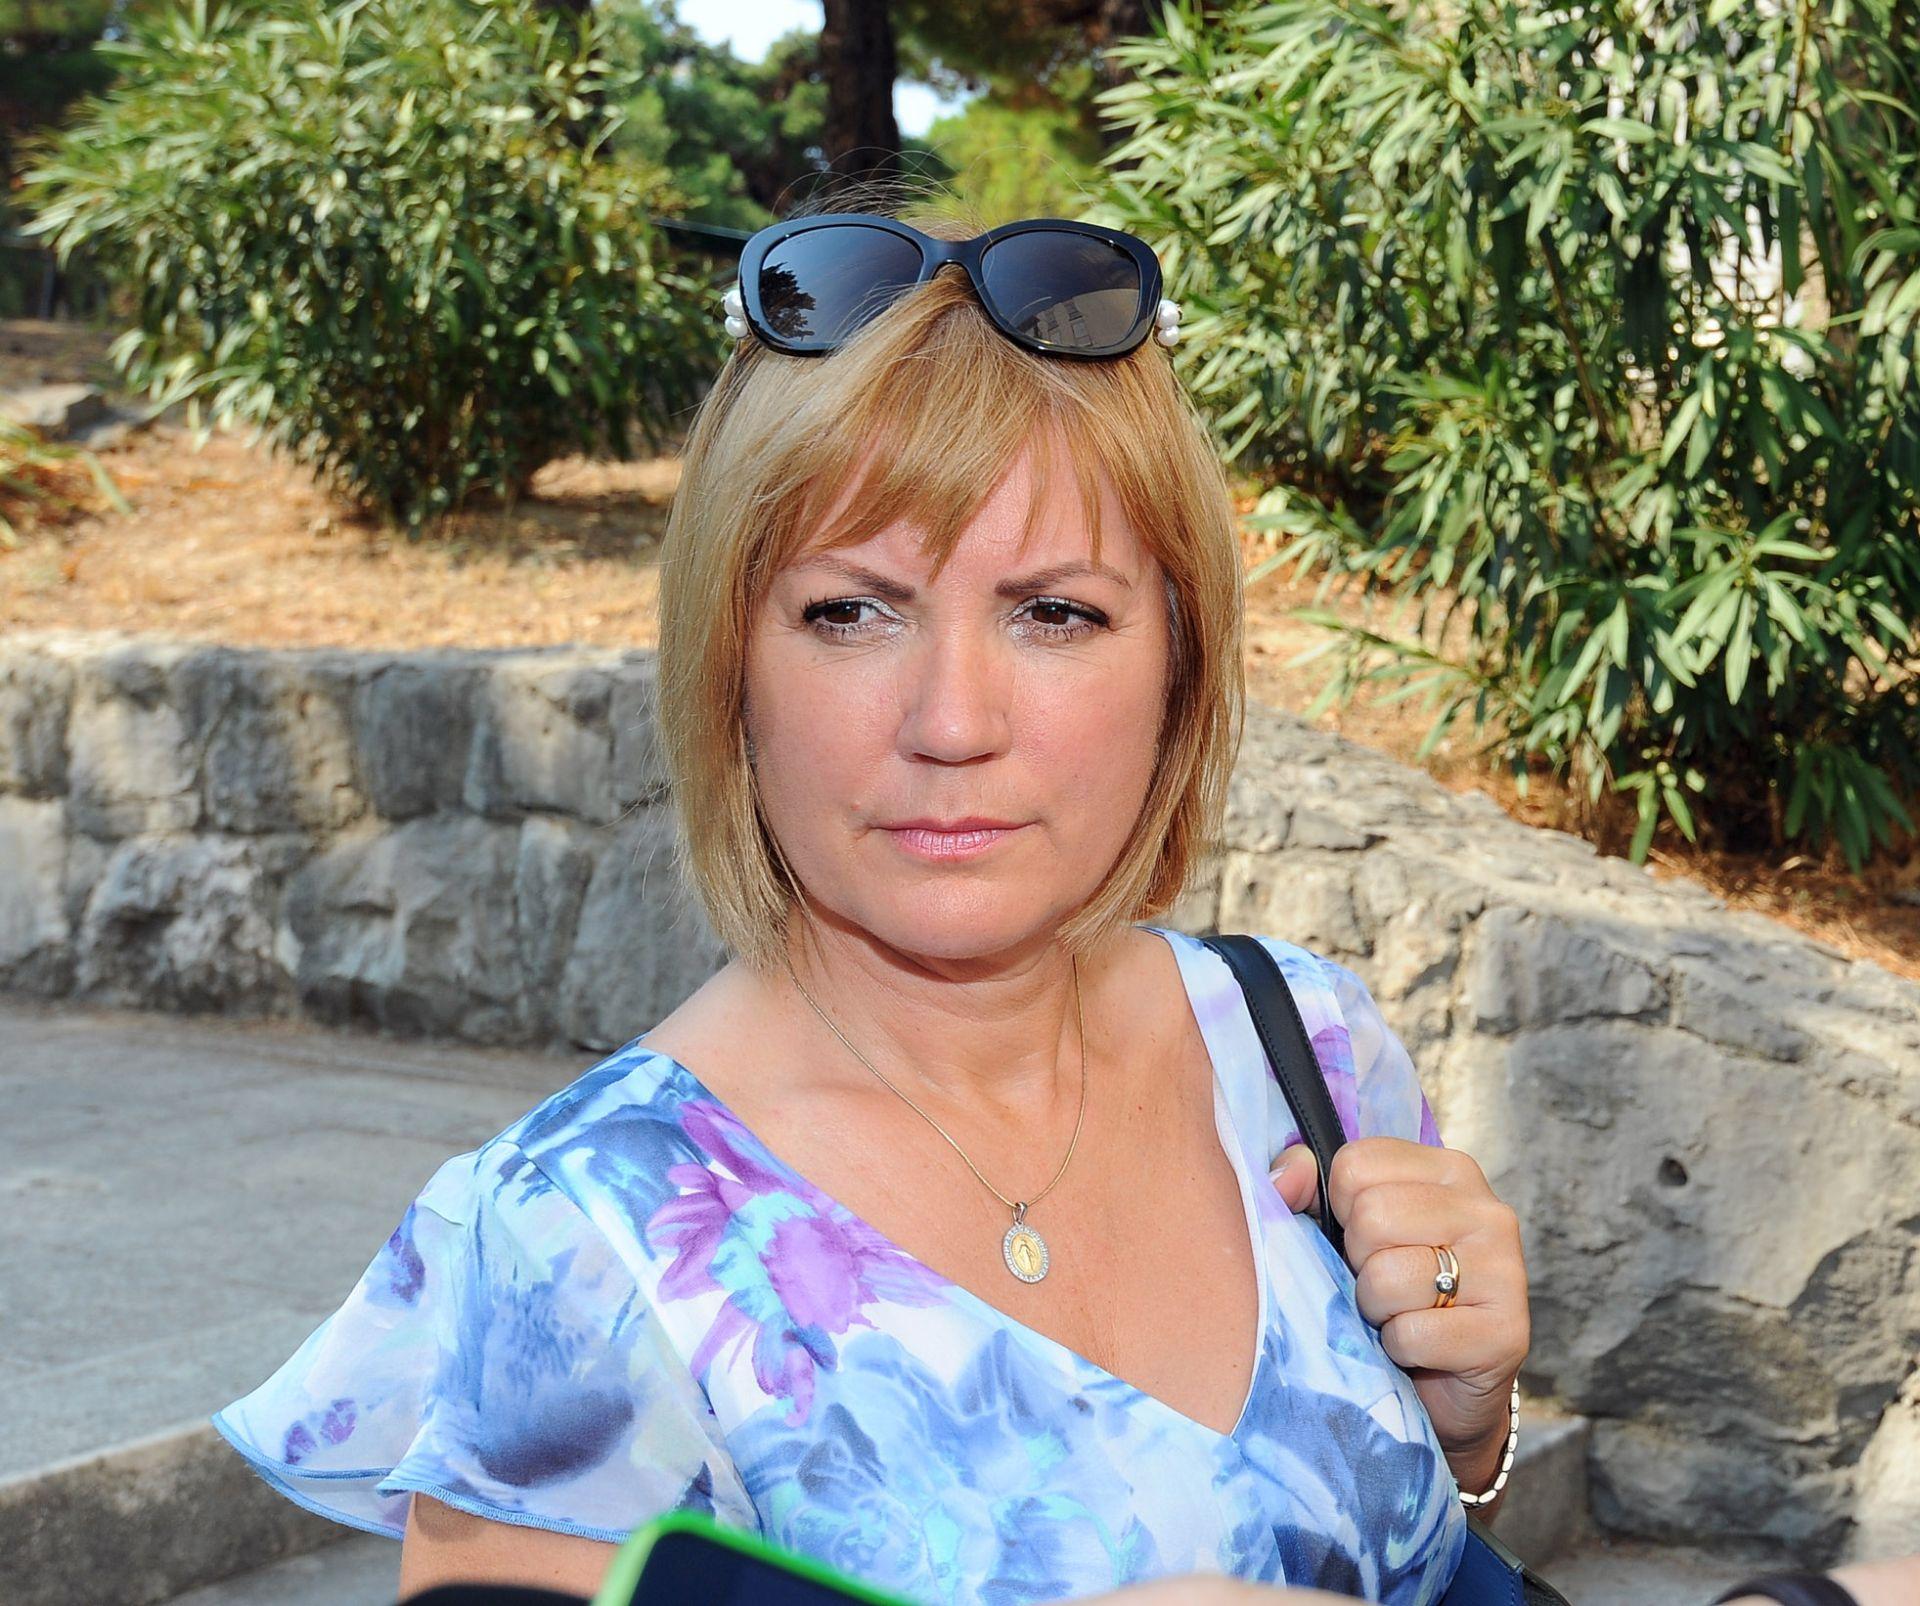 MINISTRICA JURETIĆ: Osigurana sredstva za vozila za Centar za posebno skrbništvo